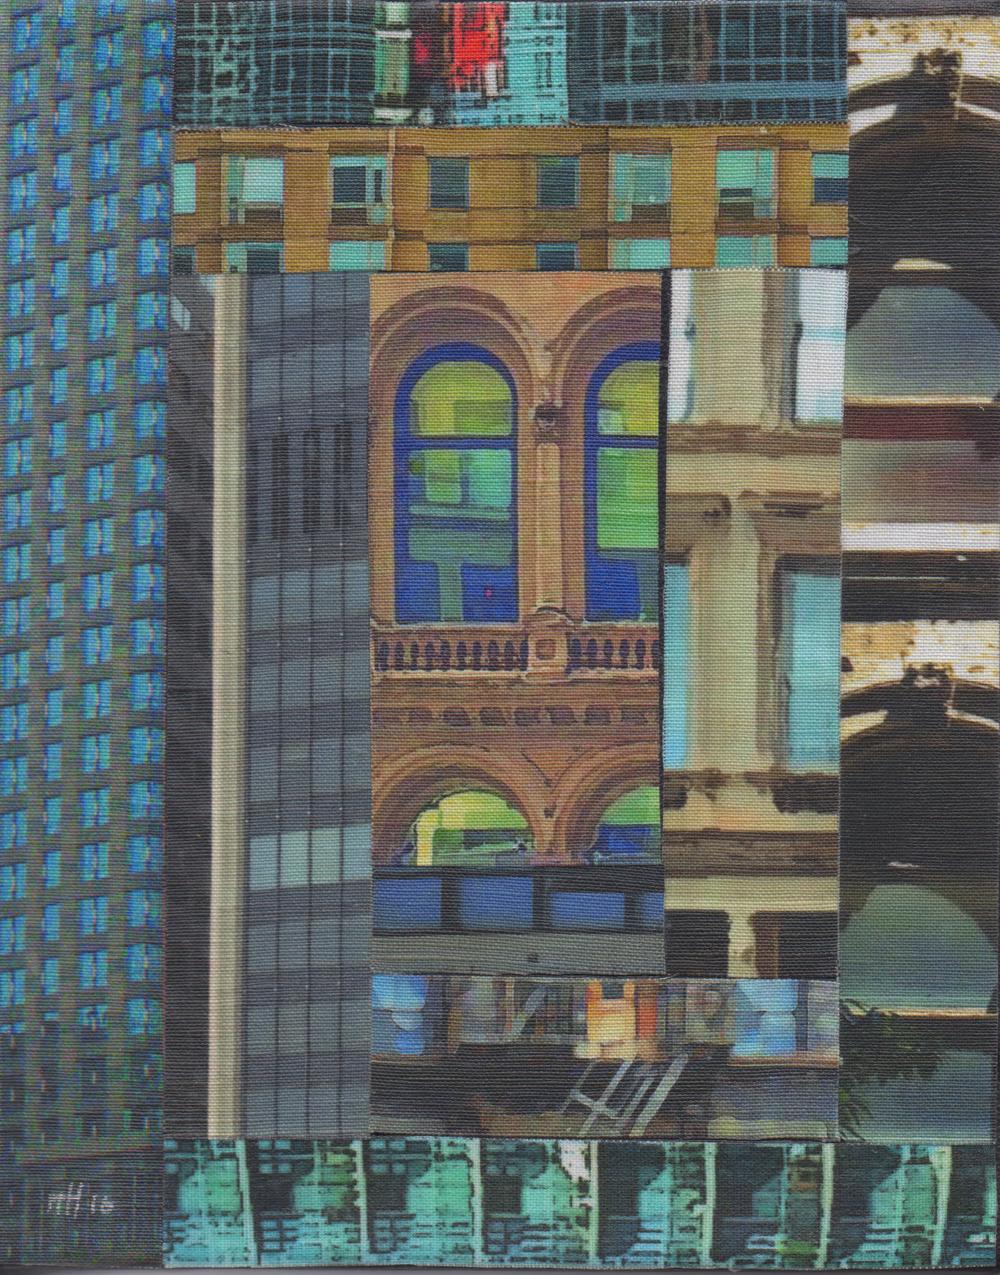 patchwork city 51